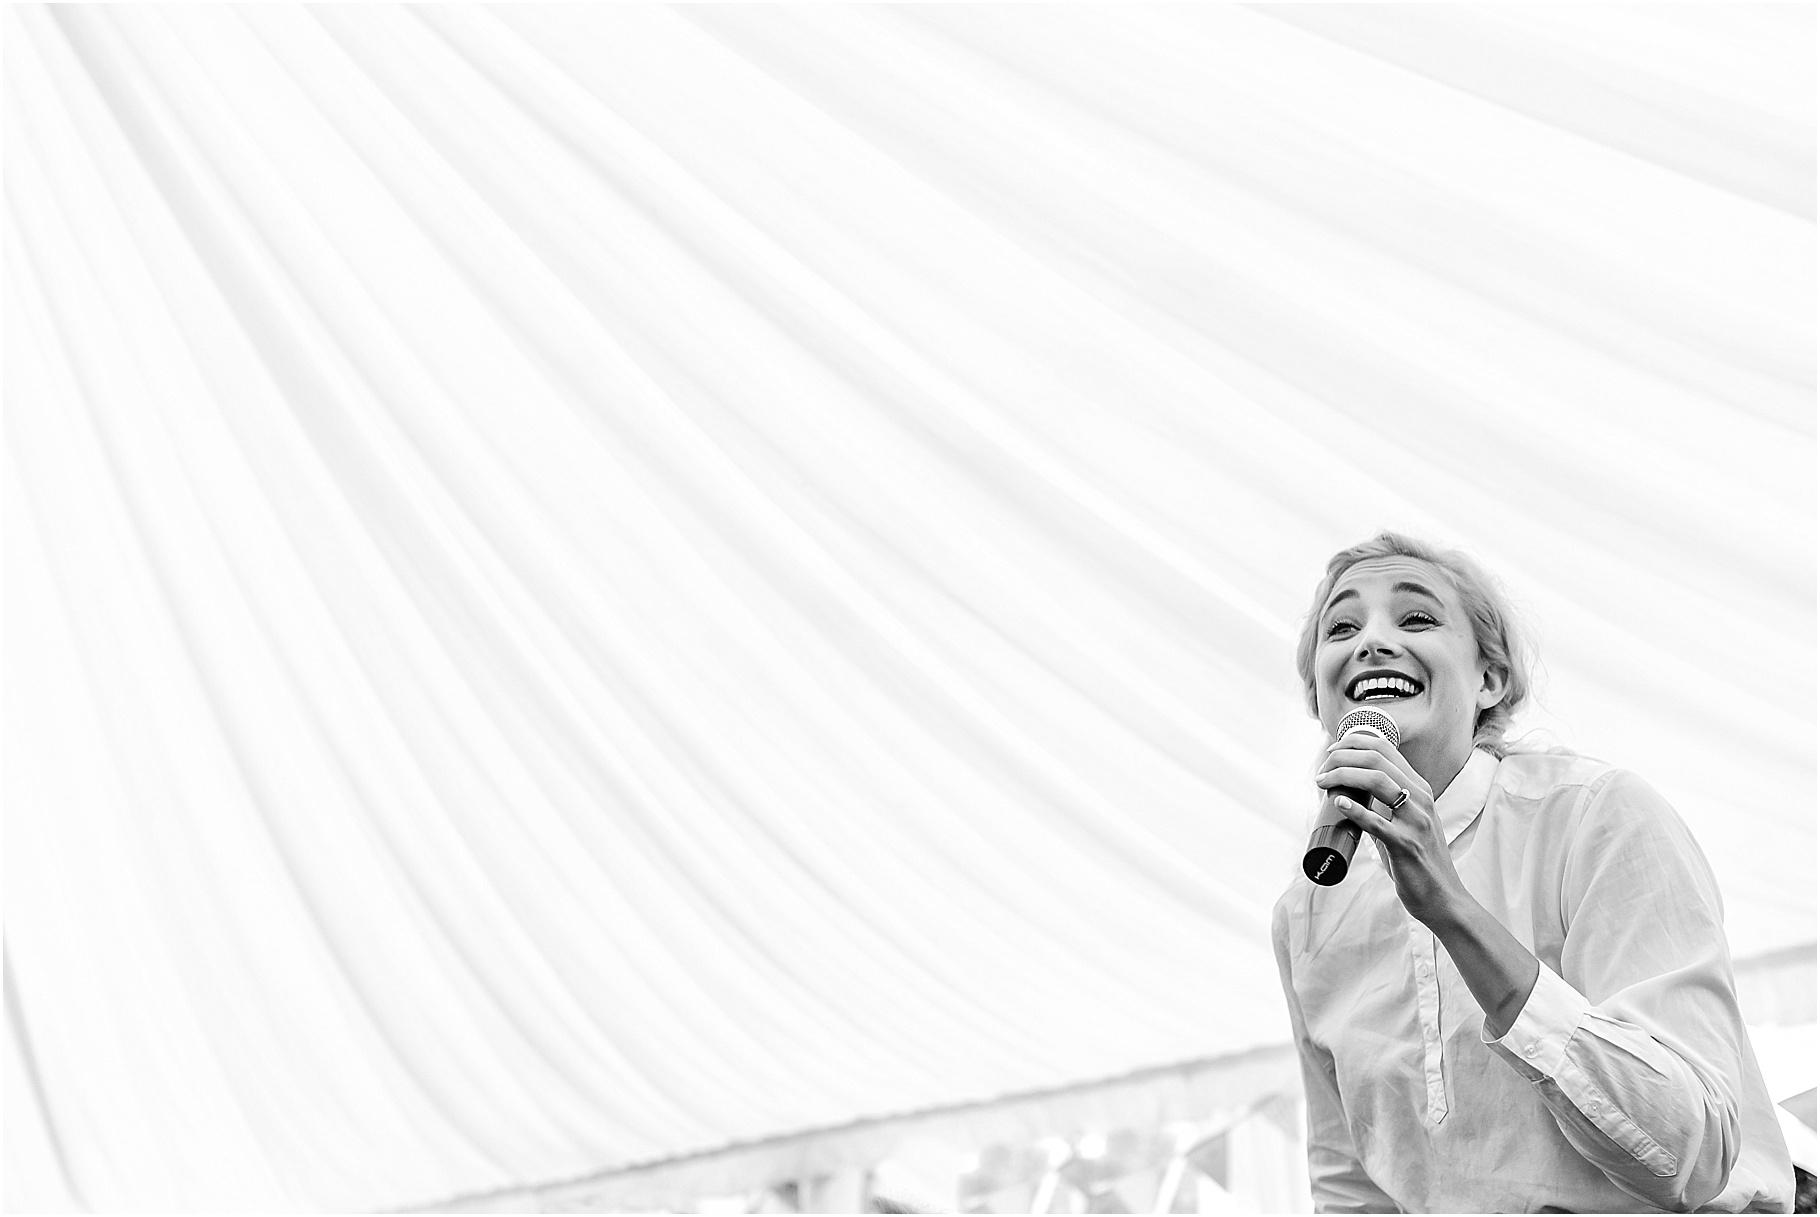 lancashire-marquee-wedding-065.jpg